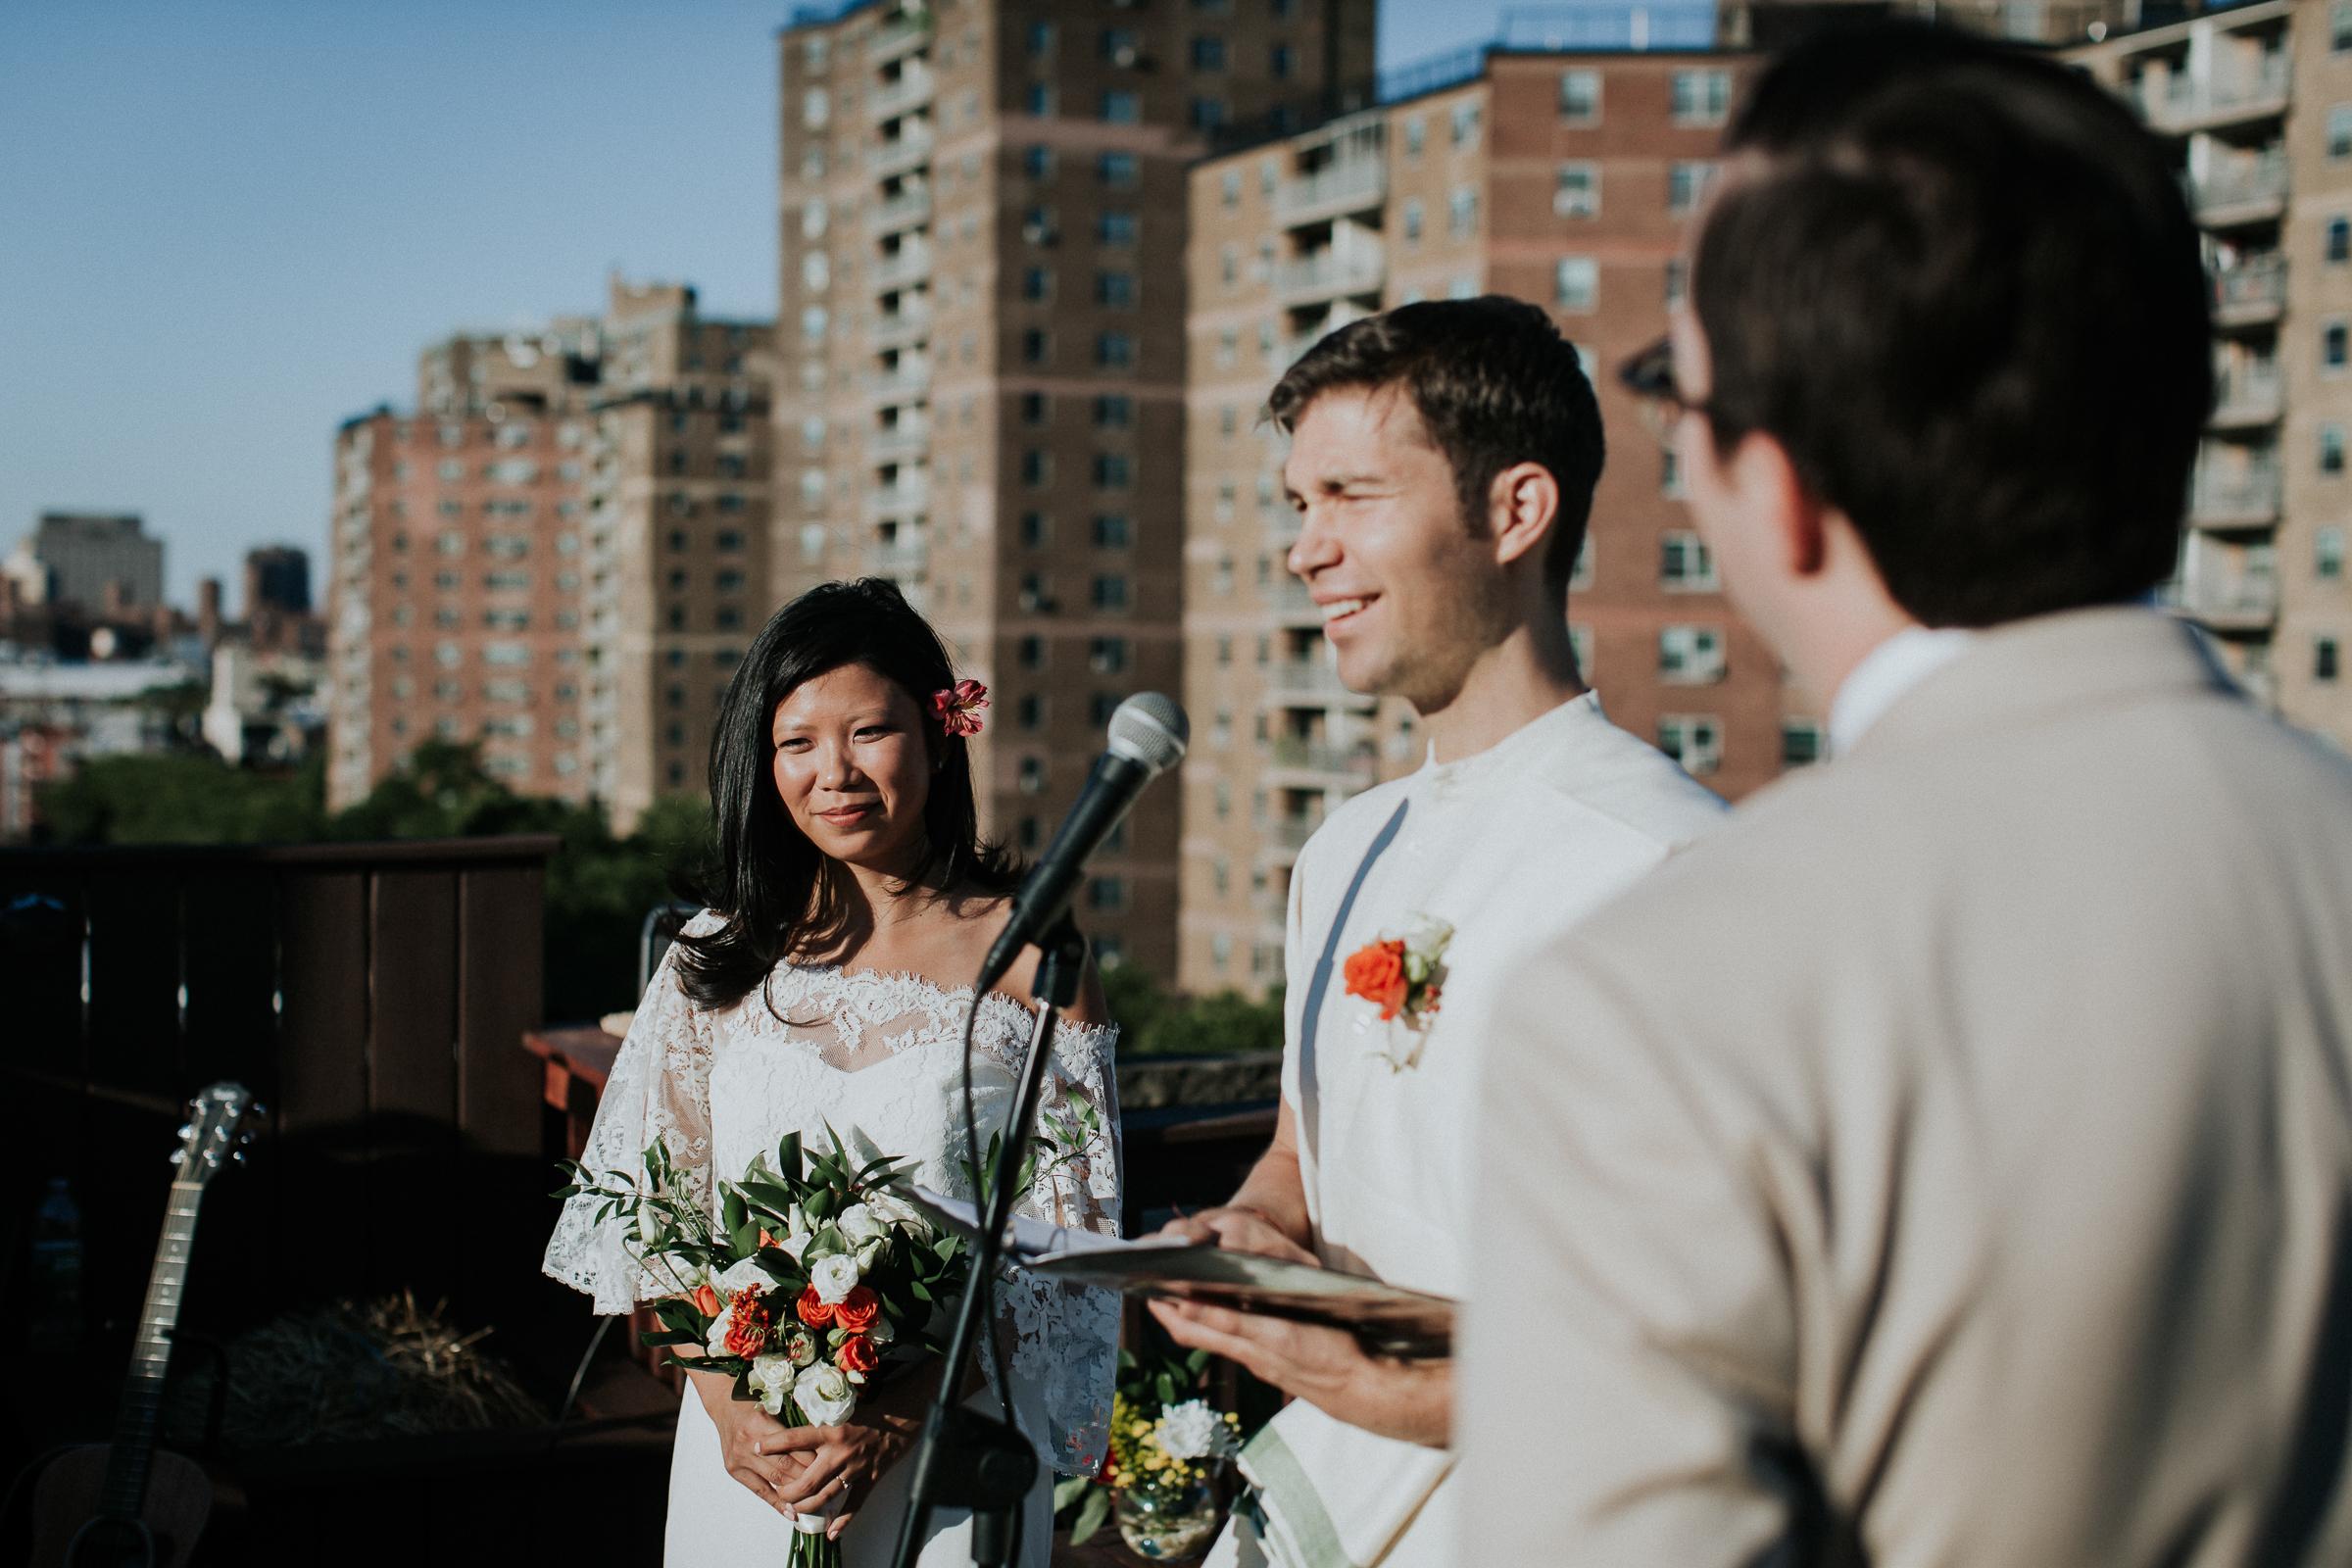 The-Bhakti-Center-Yoga-NYC-Rooftop-Documentary-Wedding-Photographer-32.jpg